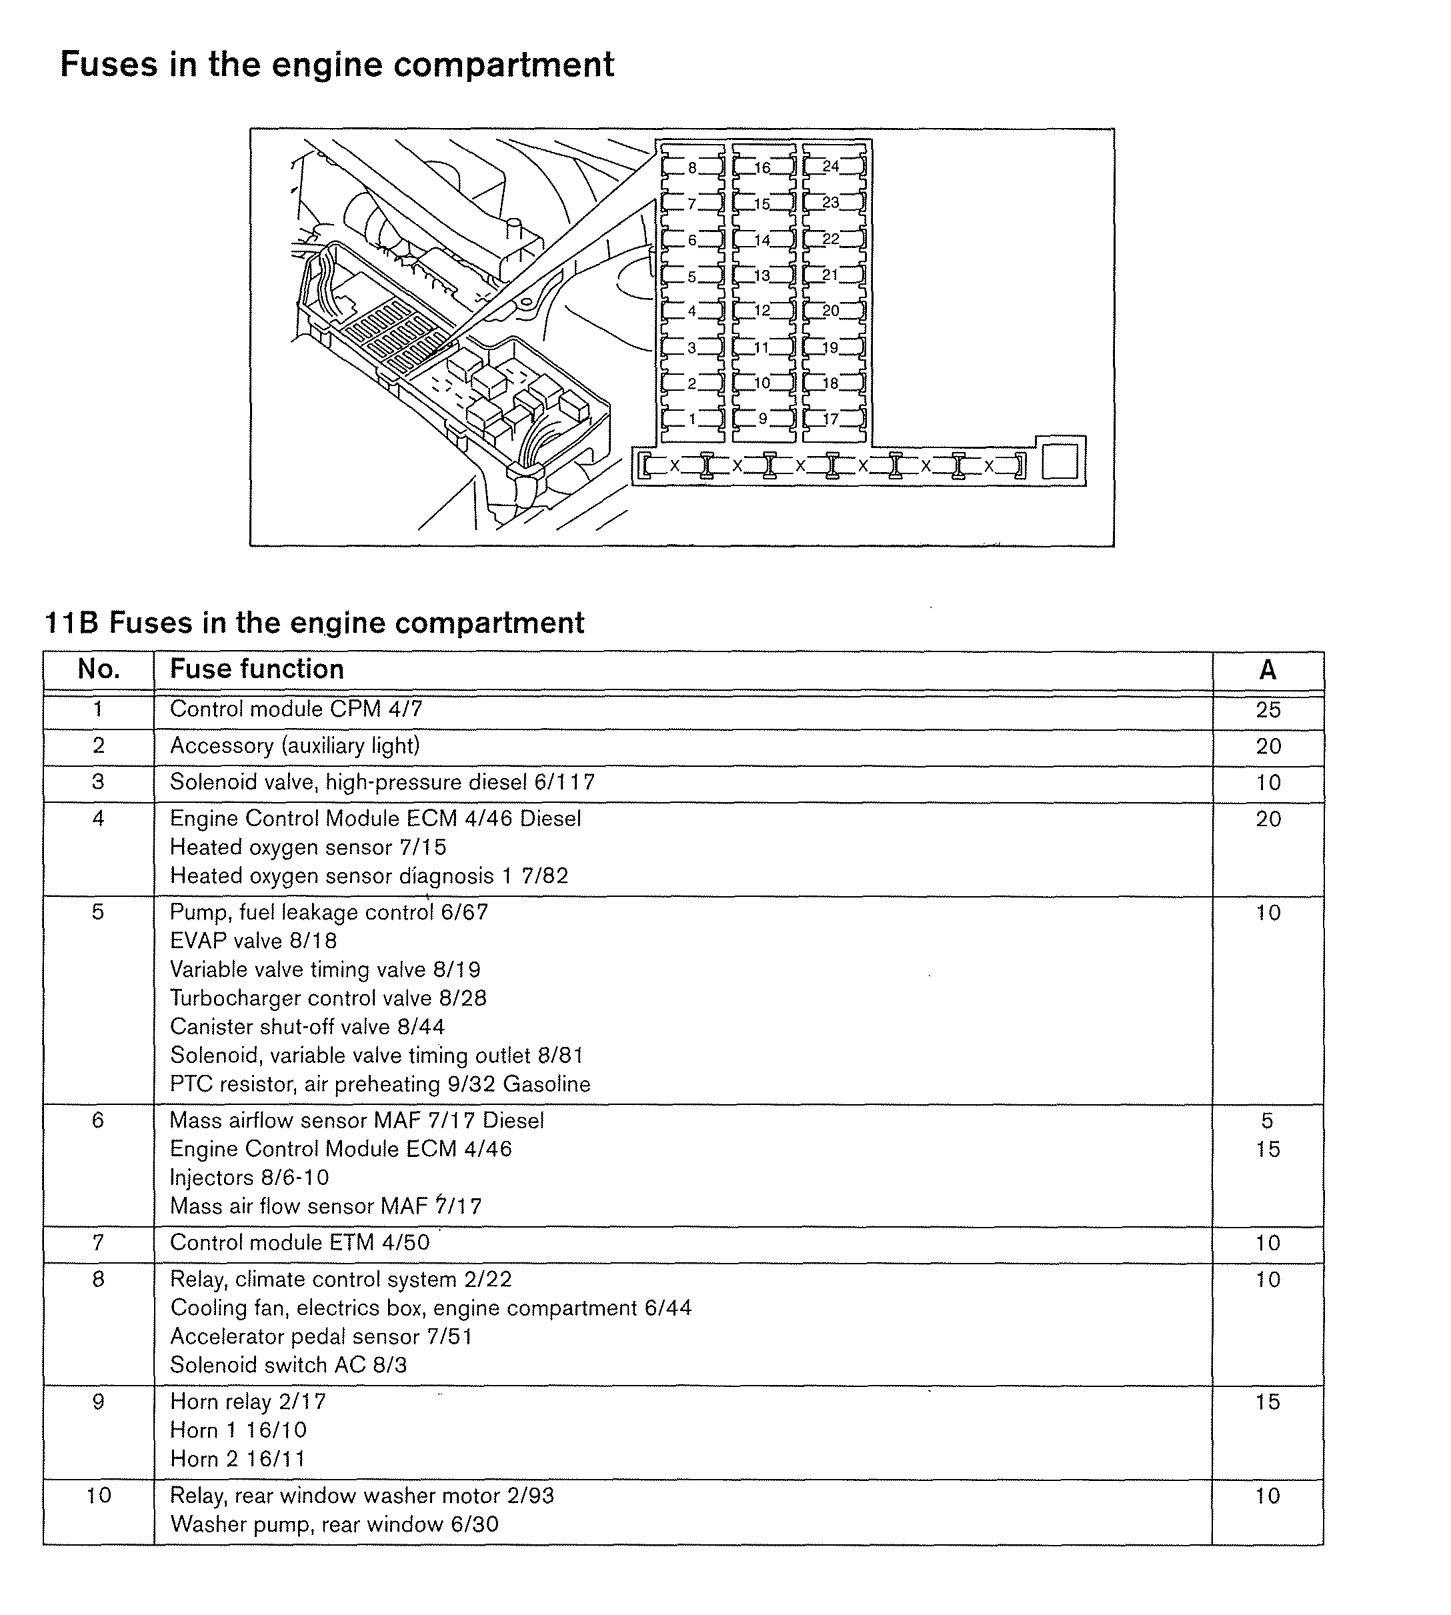 1999 Volvo S70 Fuse Box Diagram Razor Electric Chopper Wiring Diagram Bege Wiring Diagram